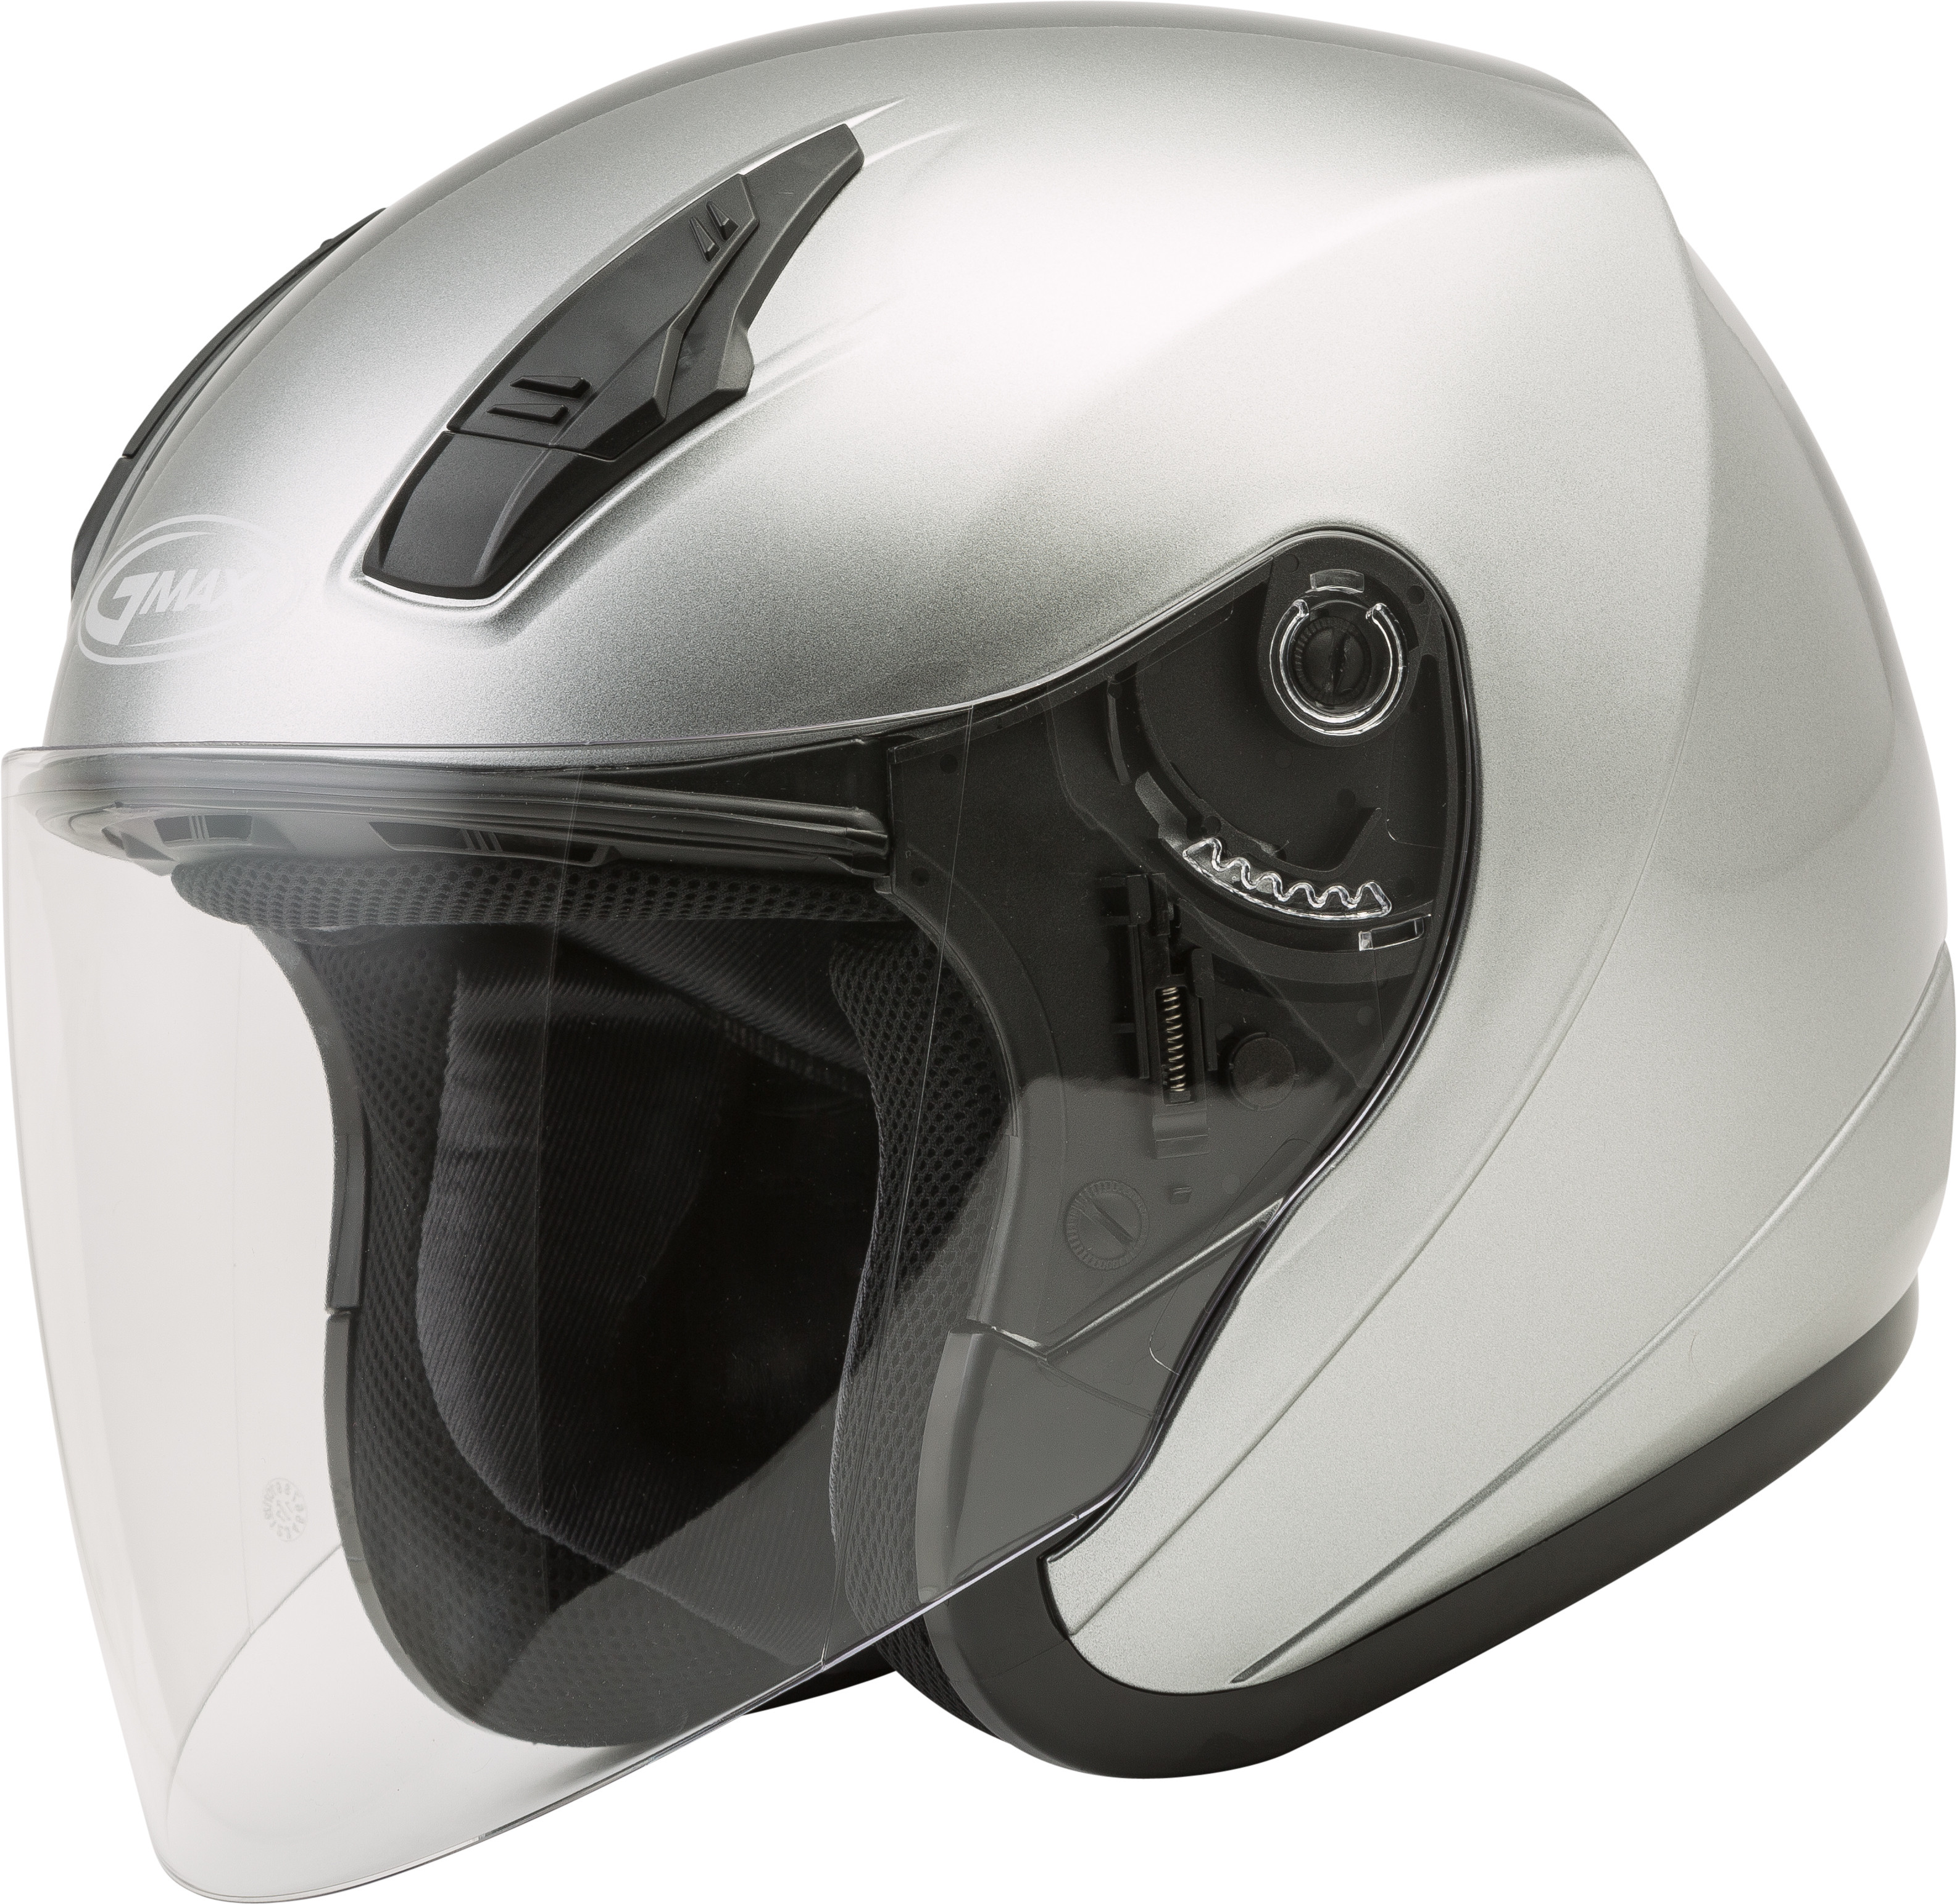 OF-17 Helmet